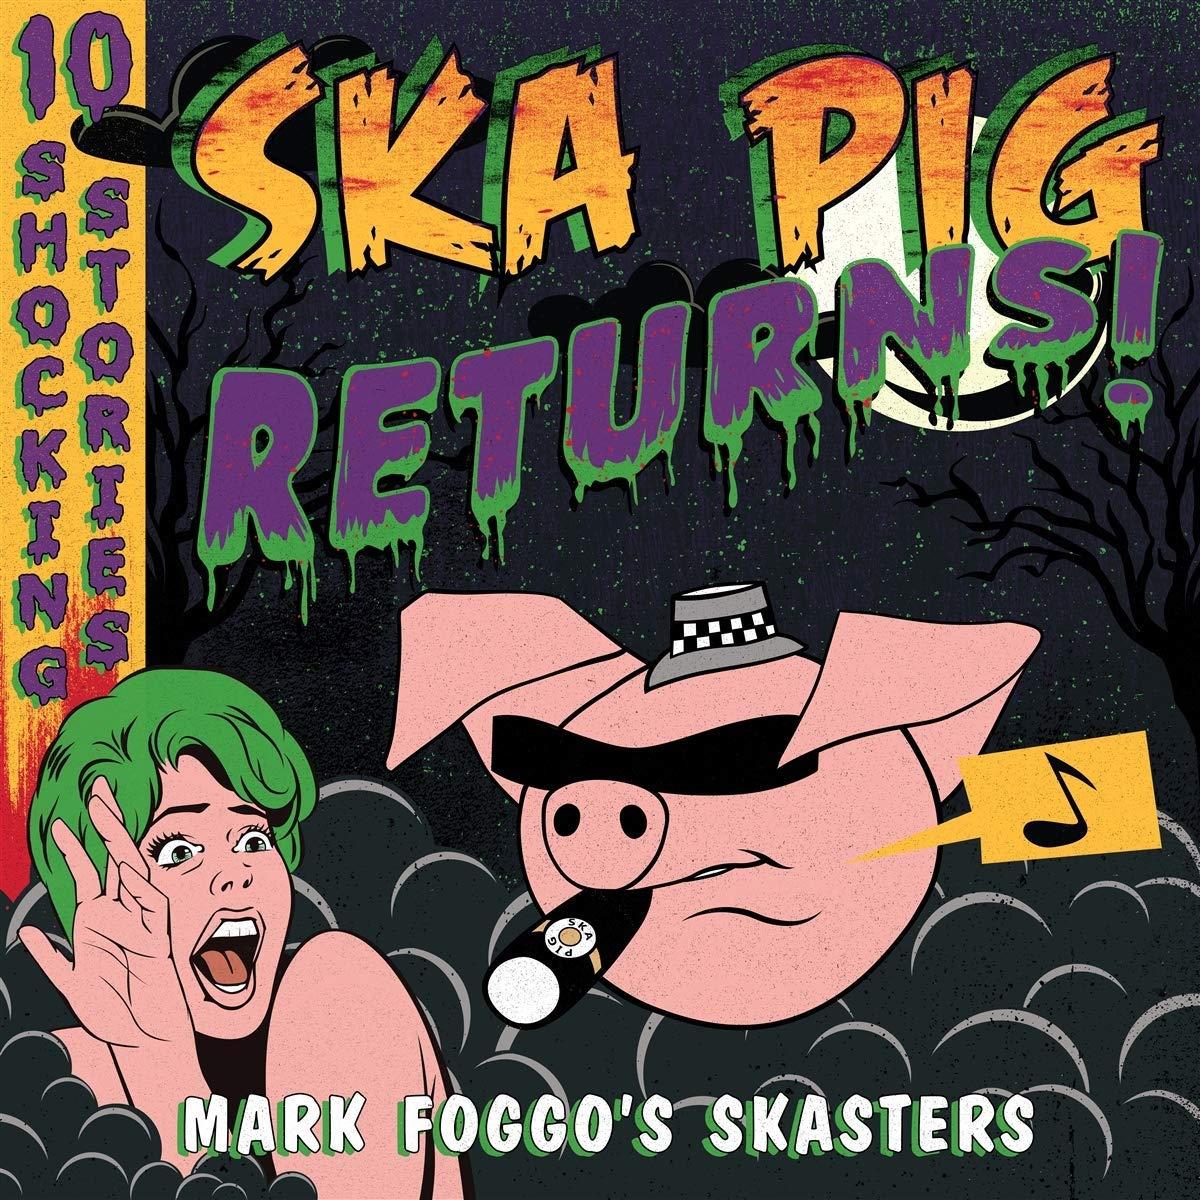 Mark Foggo's Skasters/SKA PIG RETURNS LP